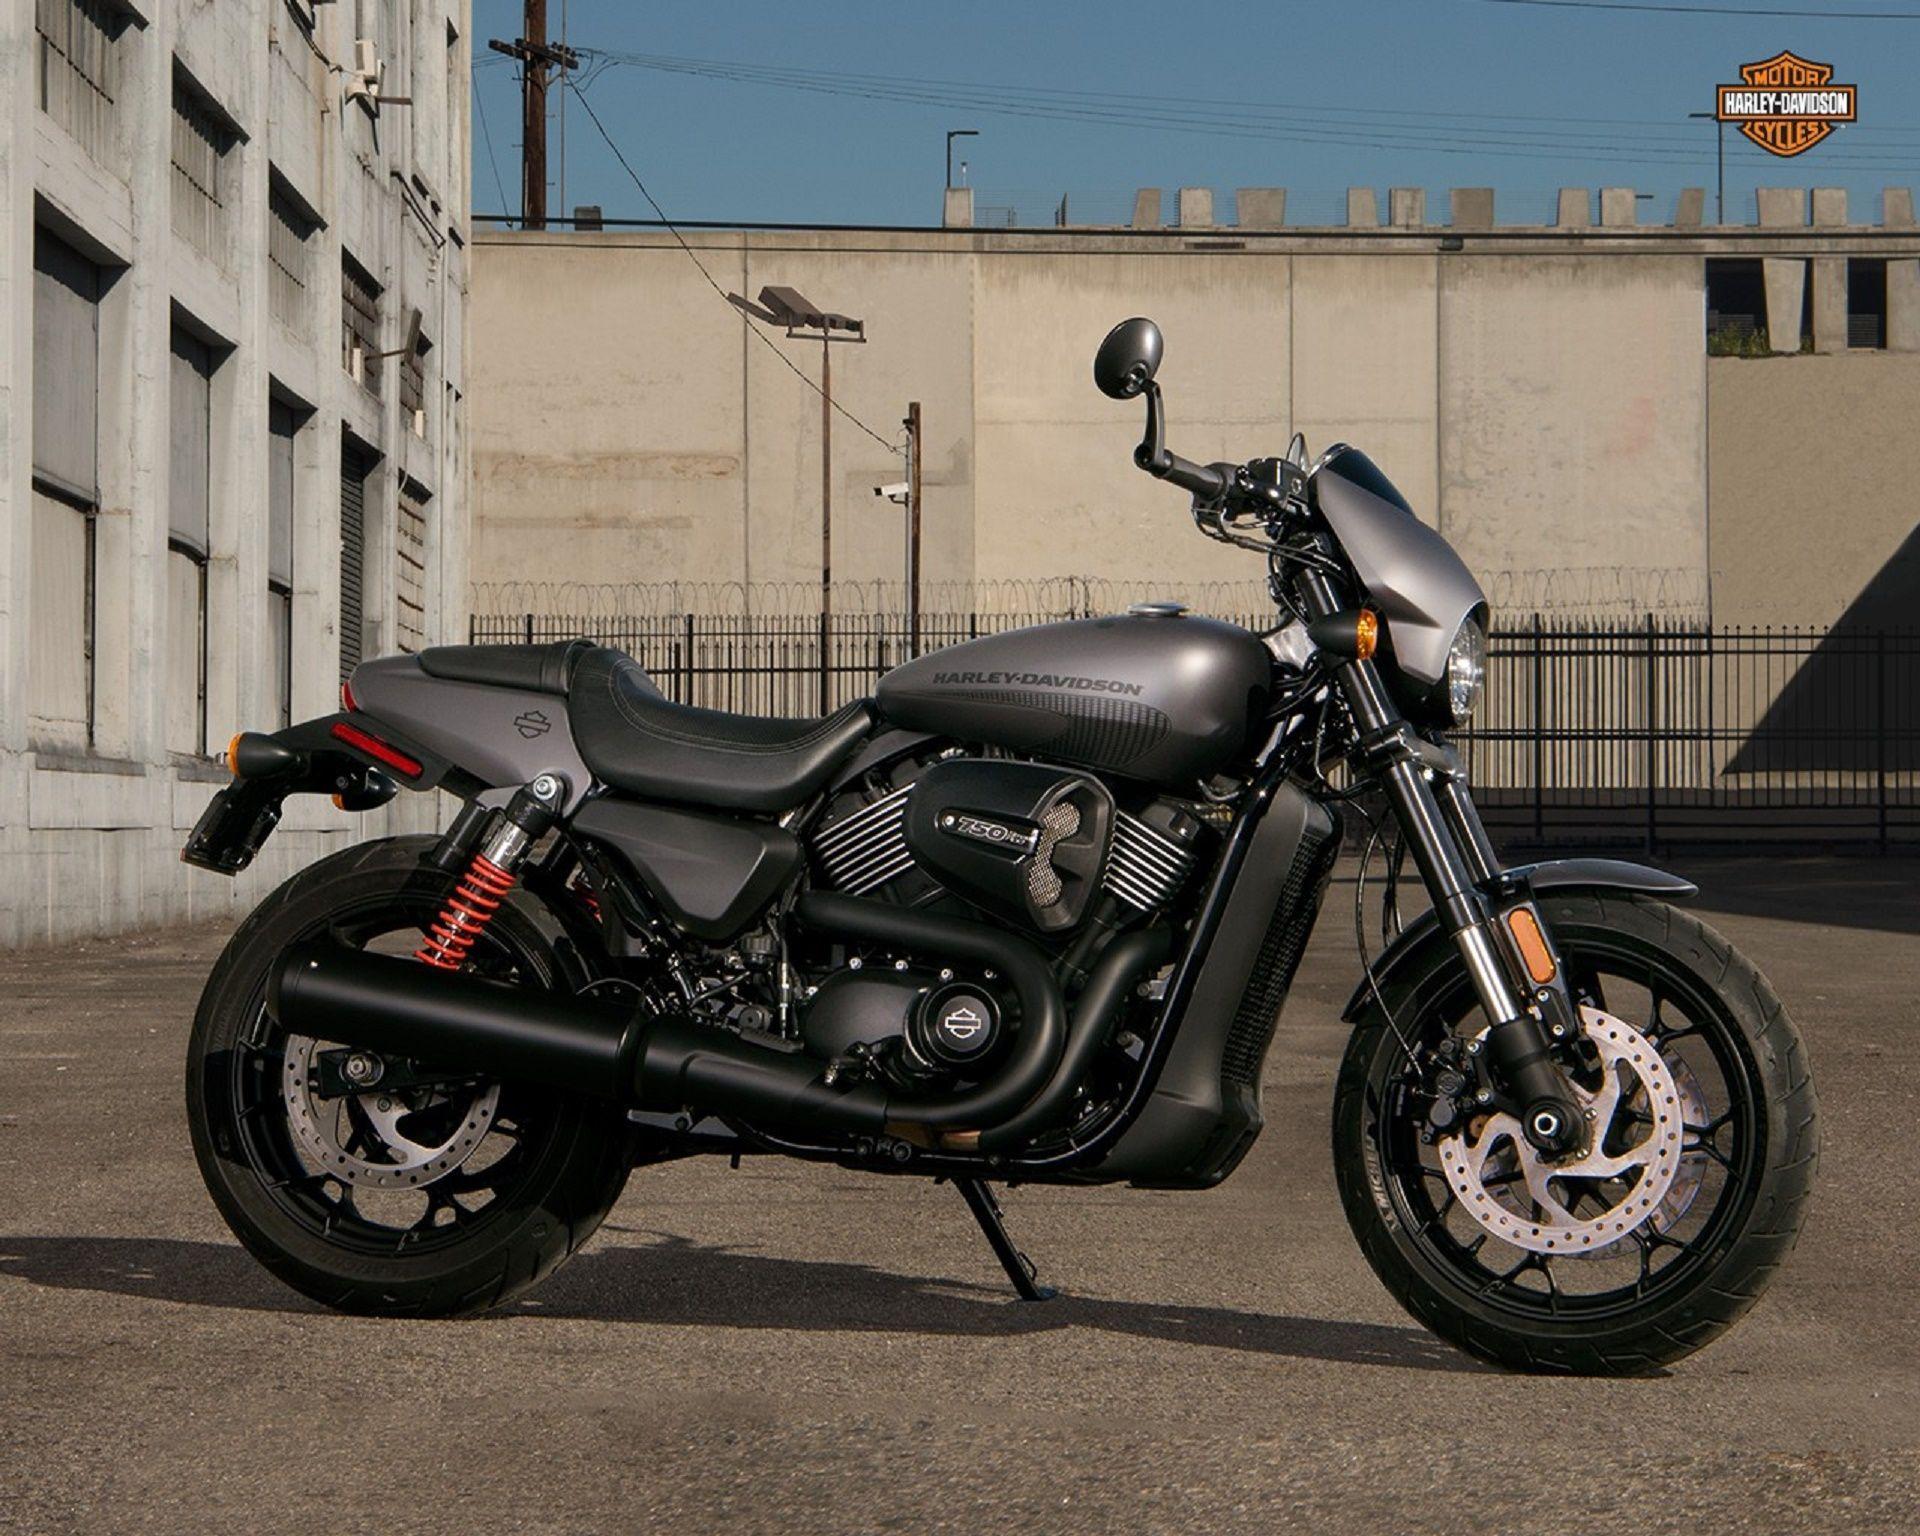 2017 Harley Davidson Street Rod 8 699 7 161 In Usa Http